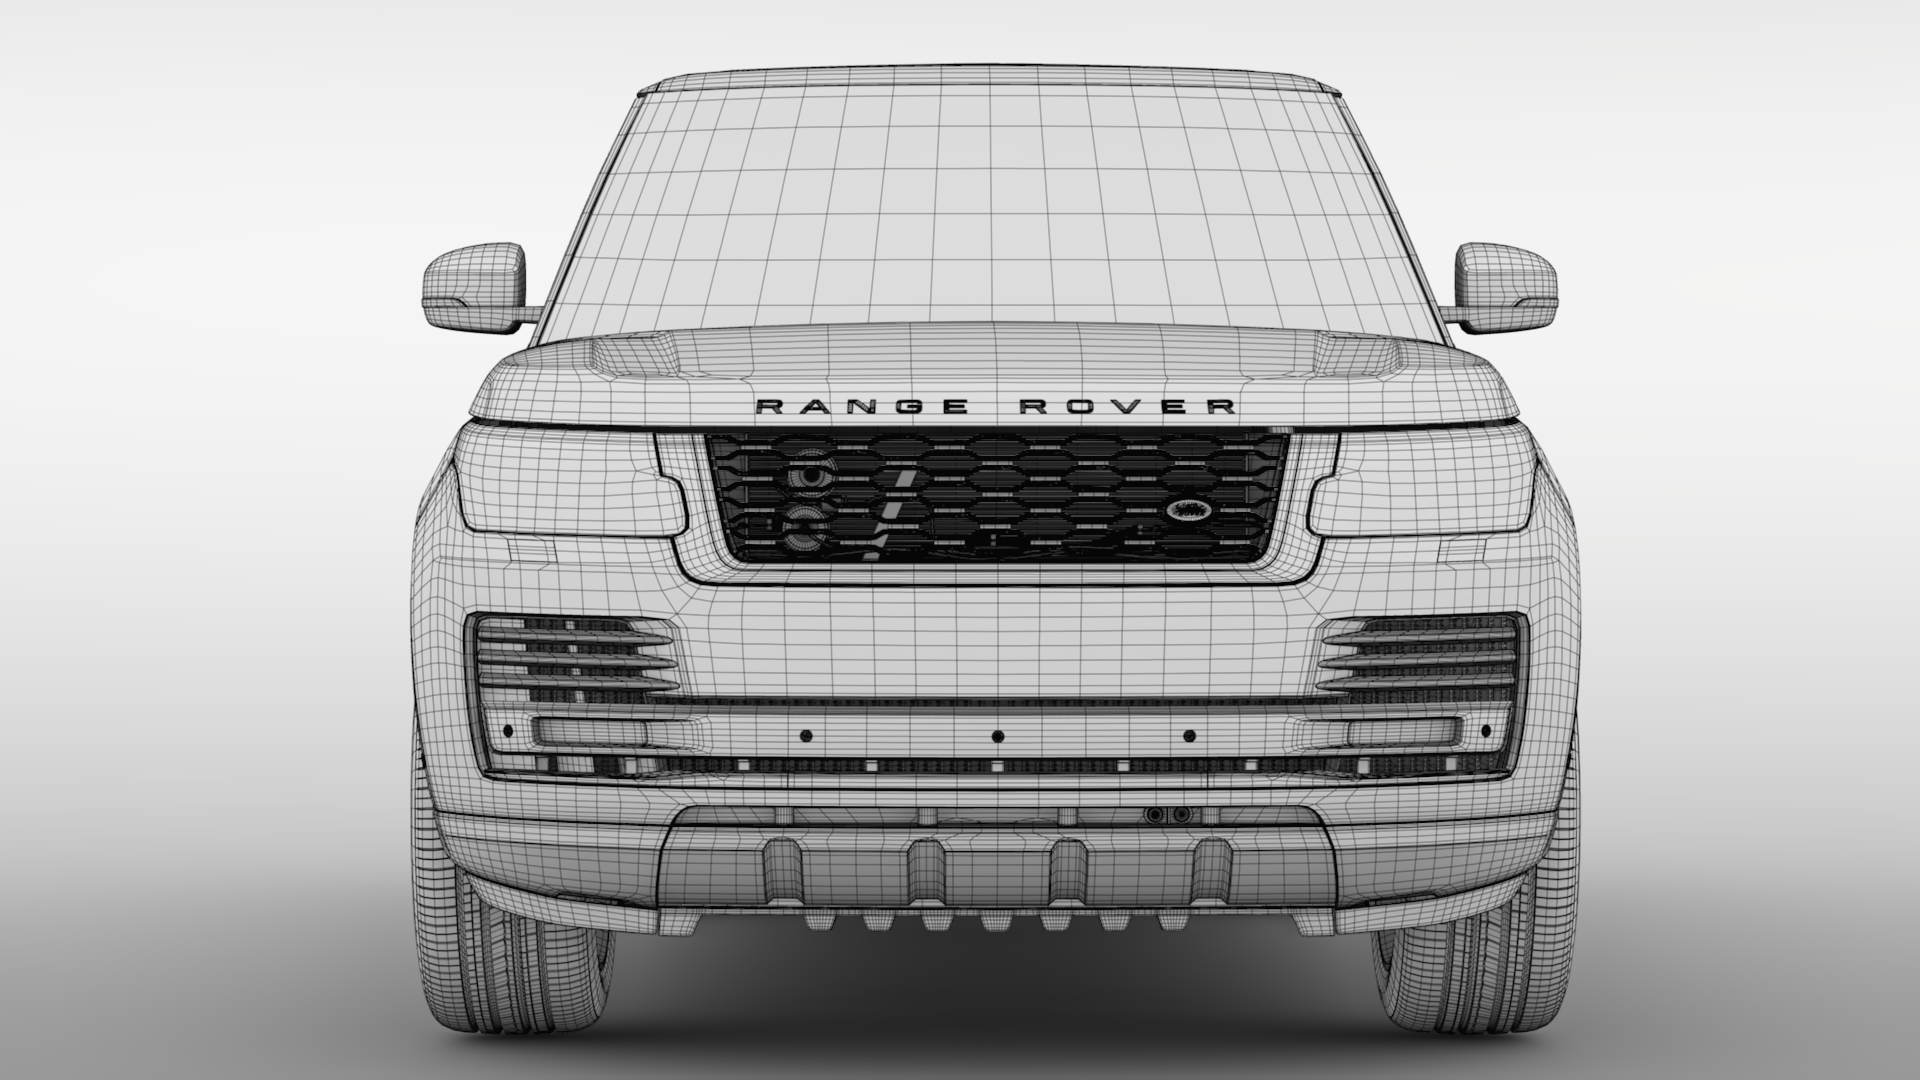 range rover vogue lwb l405 2018 3d model max fbx c4d lwo ma mb hrc xsi obj 277538